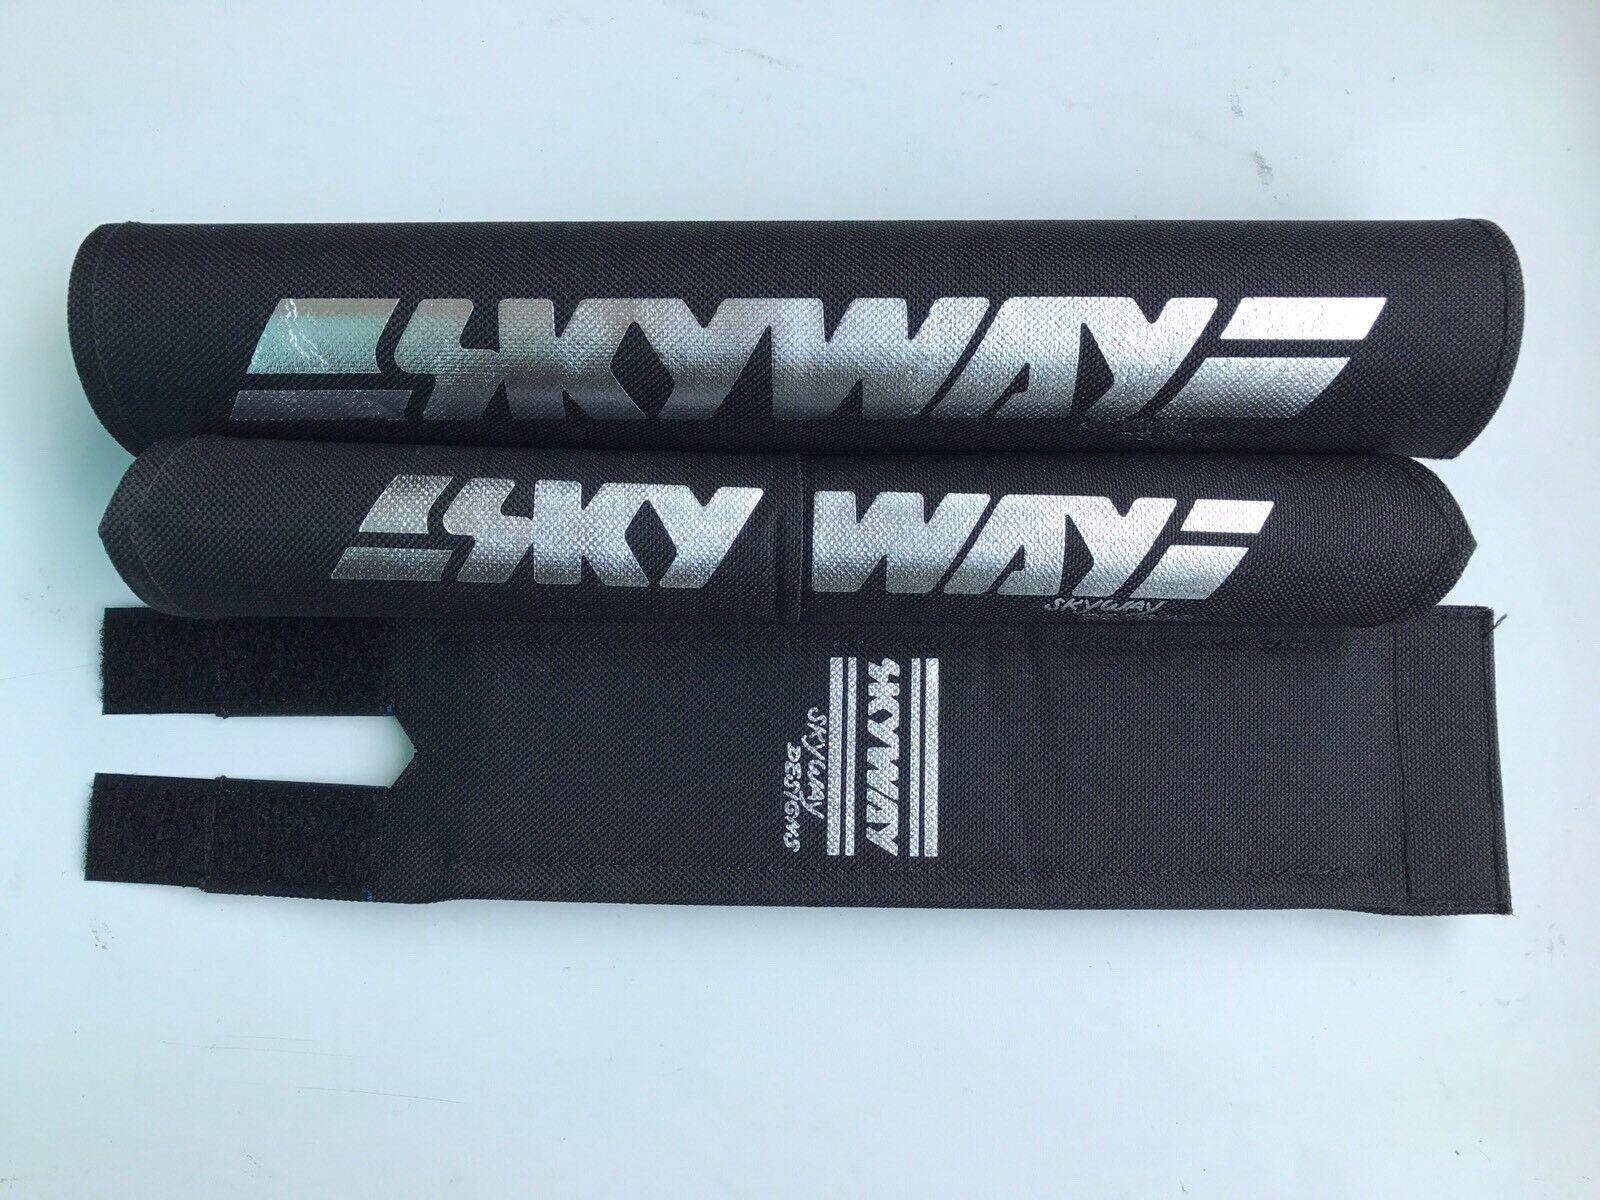 Skyway Bmx Pad Set V Oldschool REPOP Kuwahara Blk Chrome PK Ripper Tange